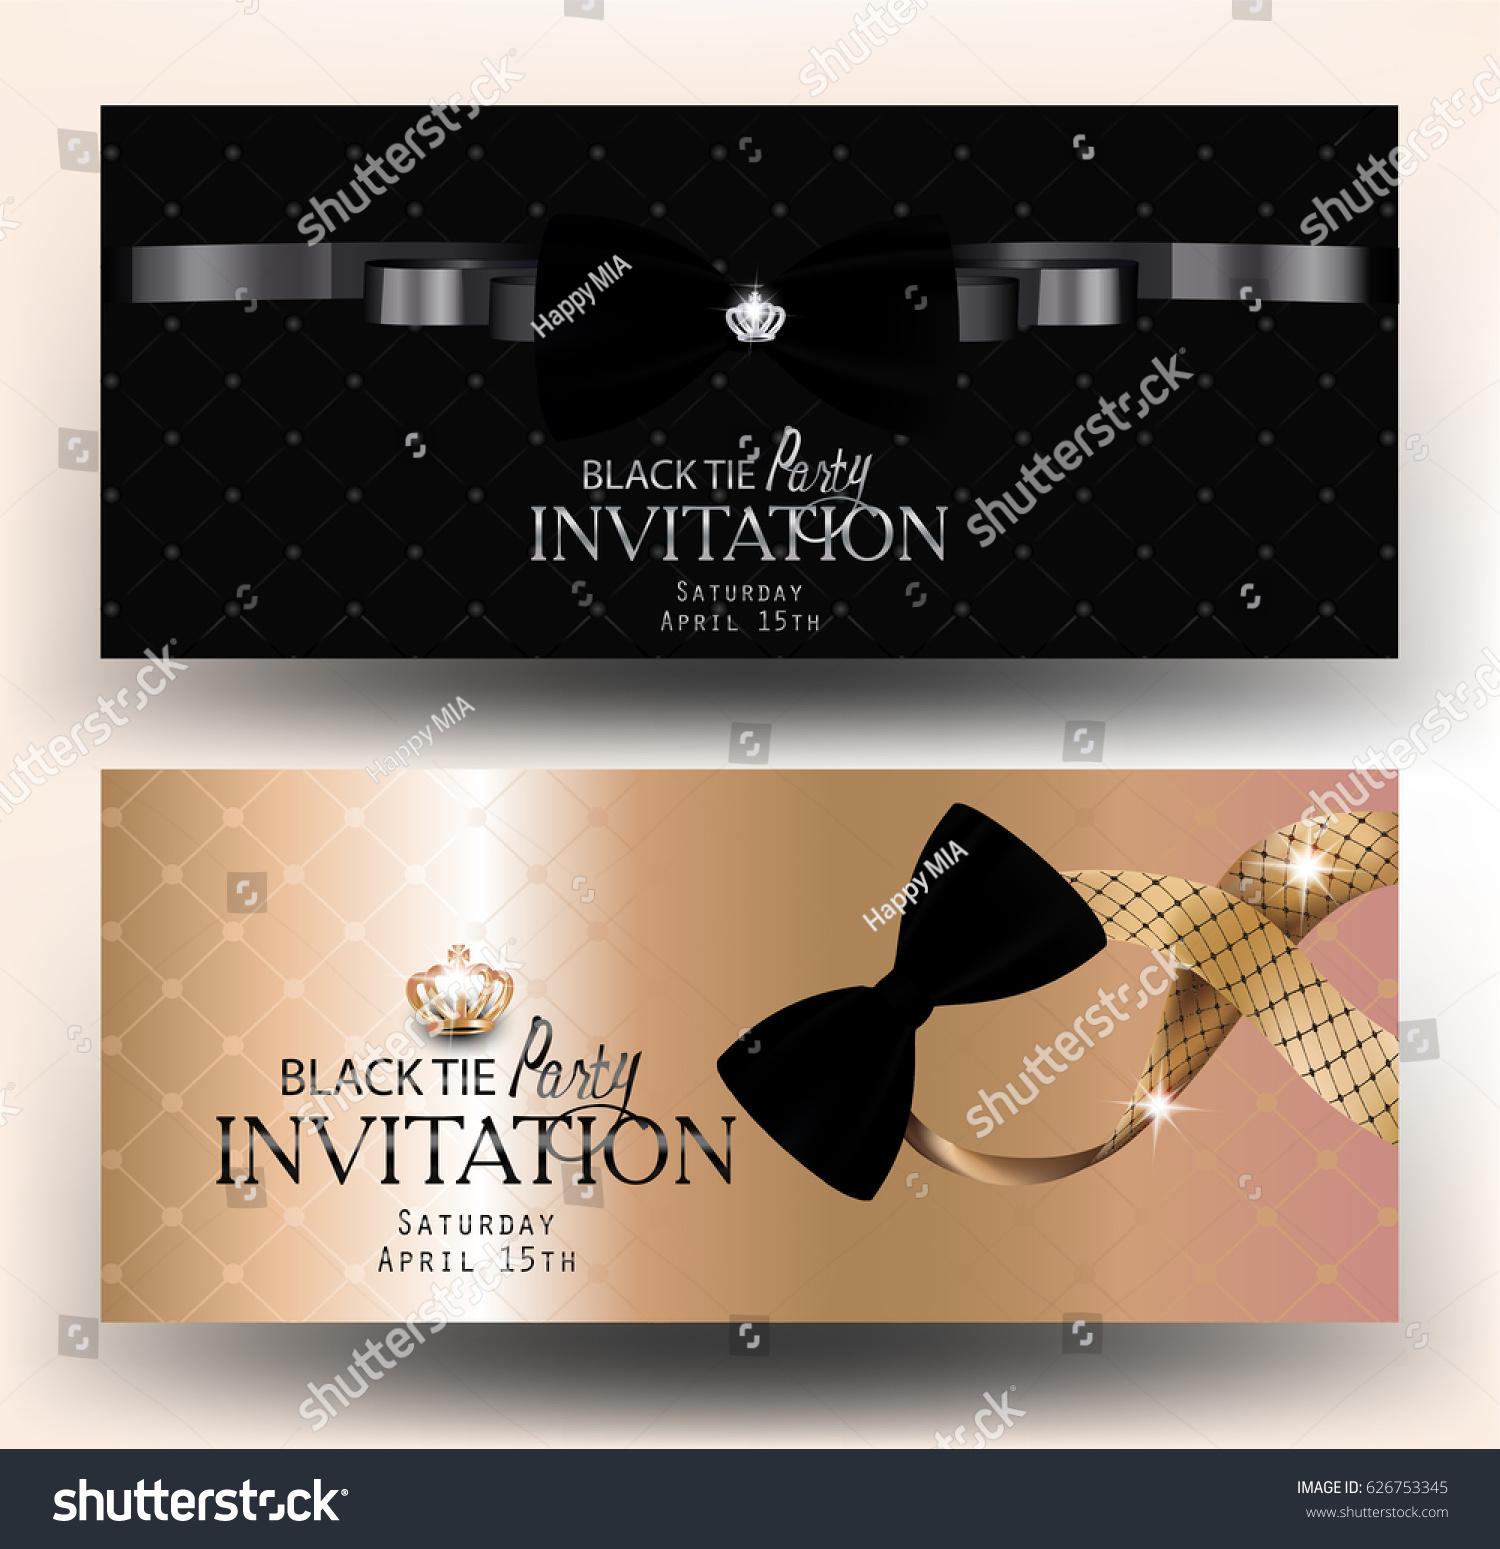 Black Tie Party Invitation Banners Vector Stock Vector 626753345 ...